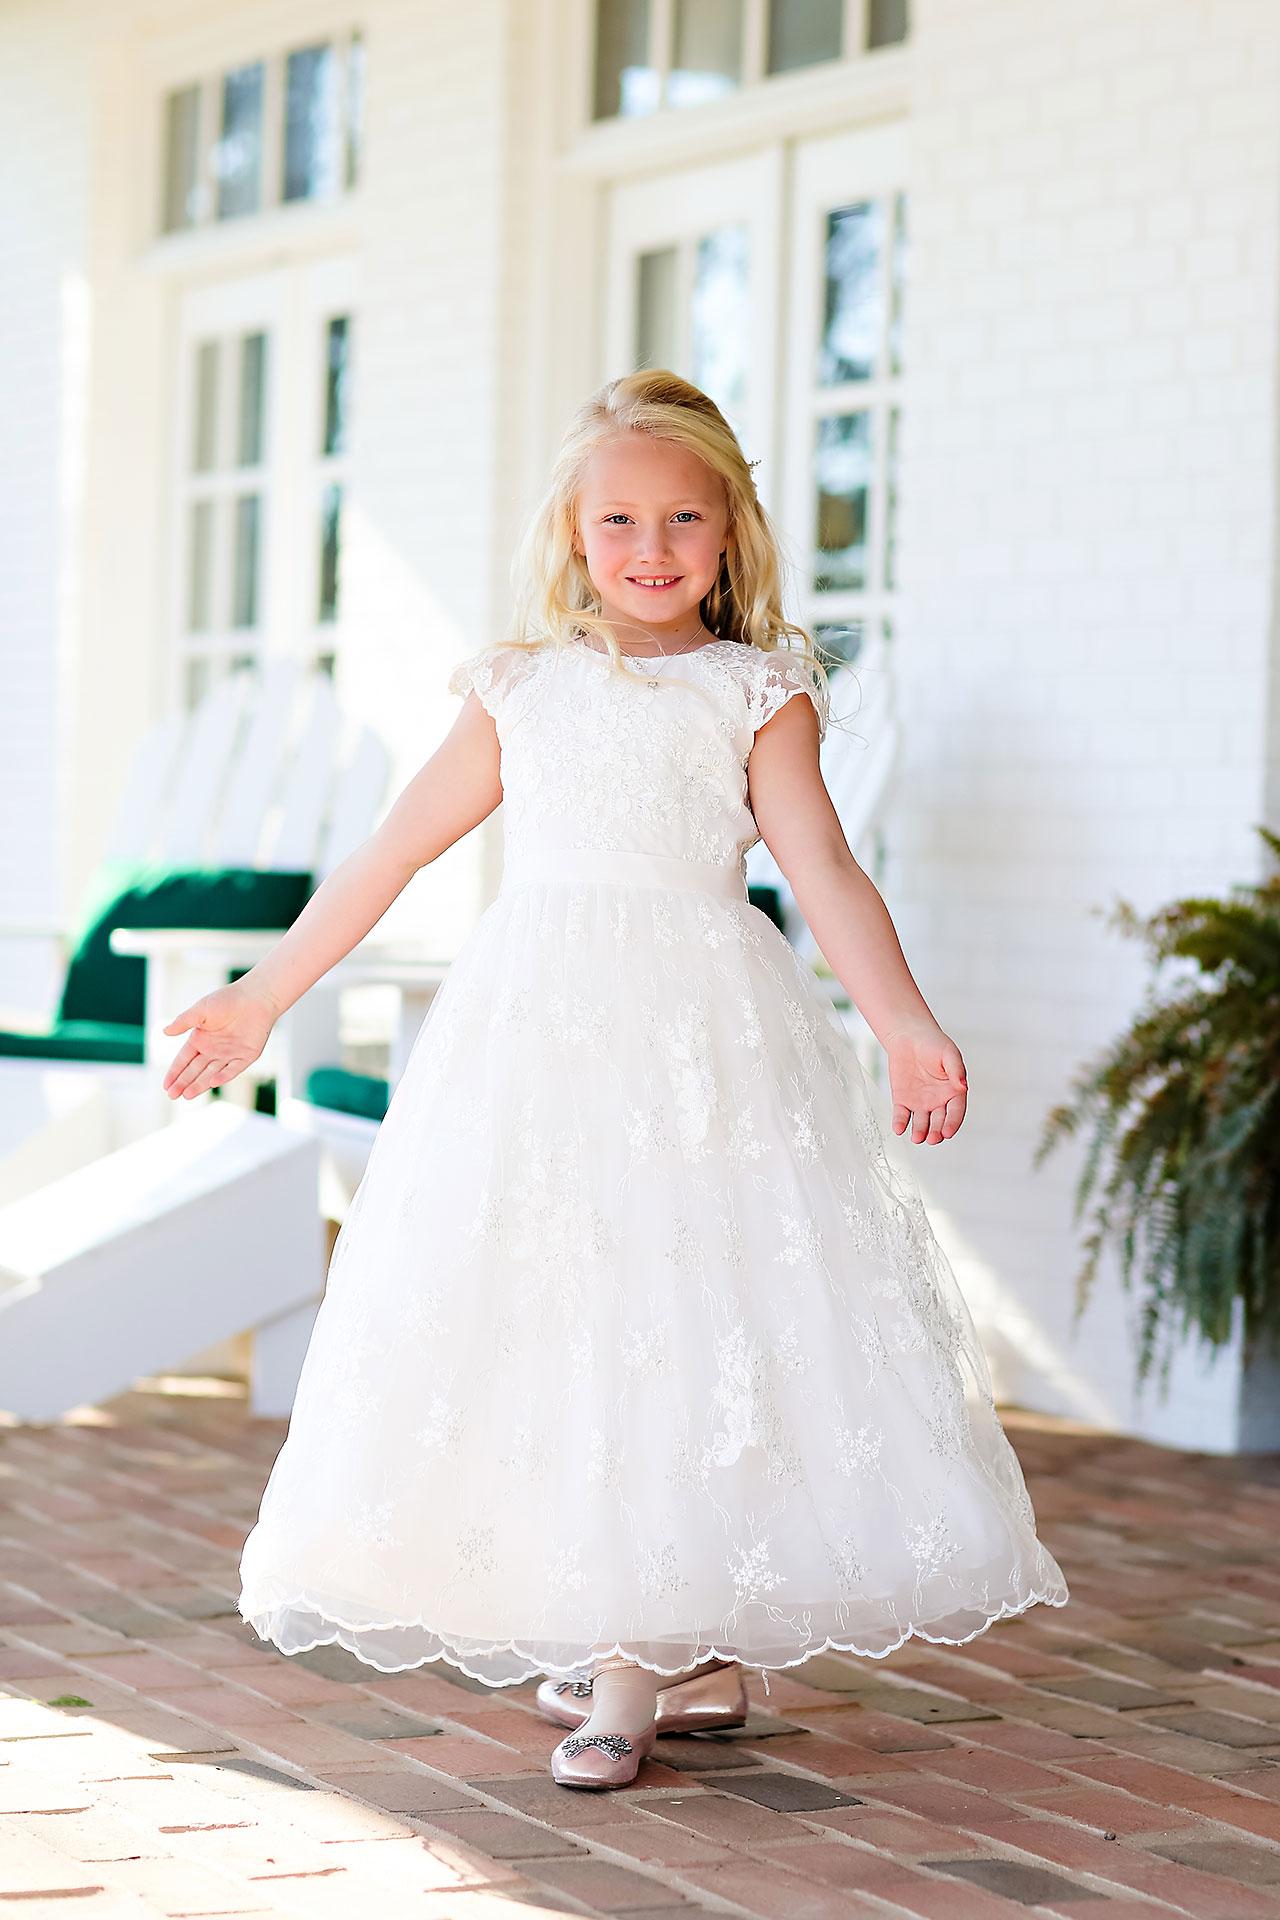 Ashley Steve Bloomington Indiana Wedding 094